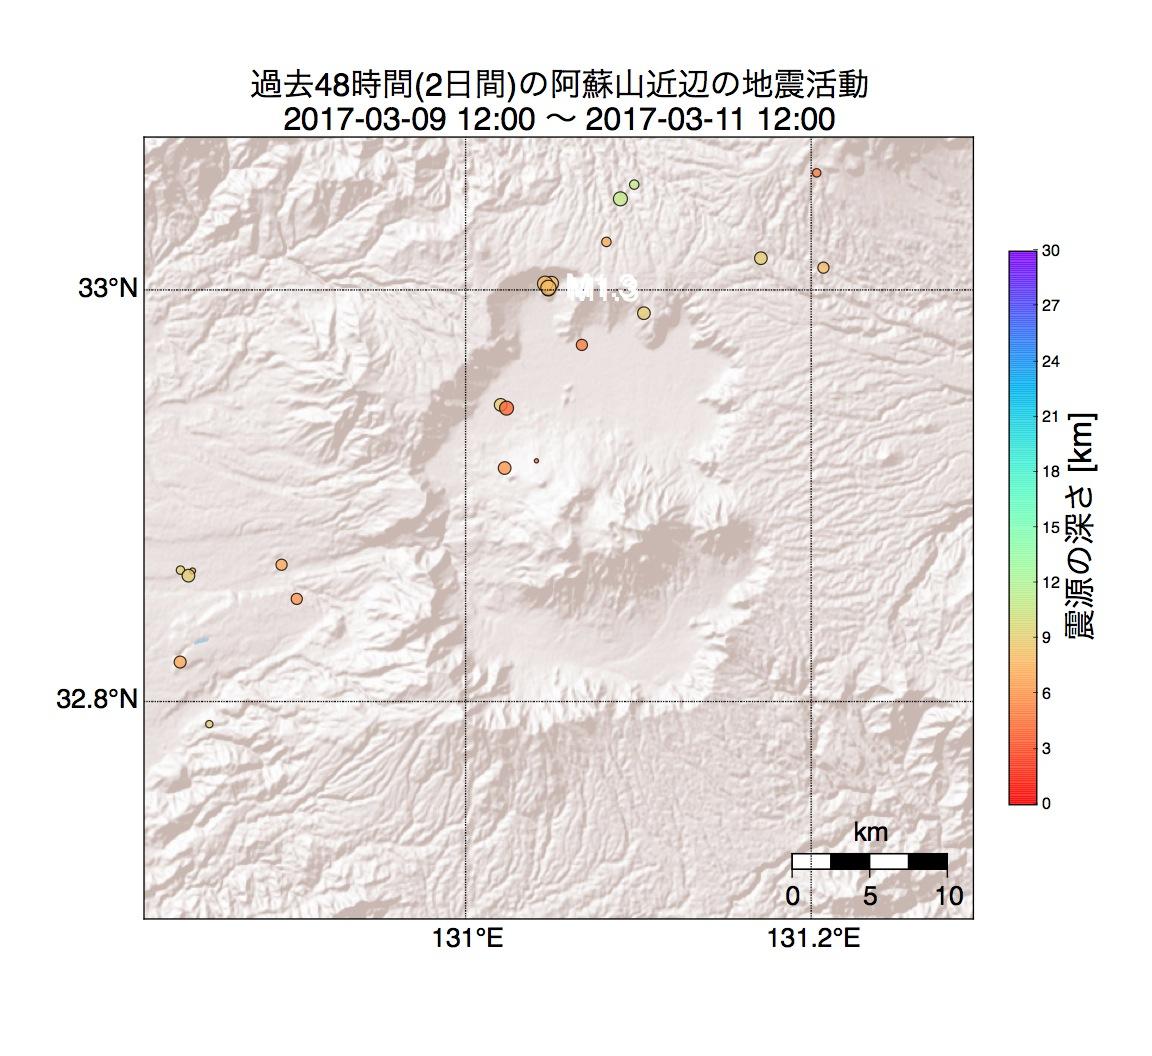 http://jishin.chamu.org/aso/20170311_1.jpg